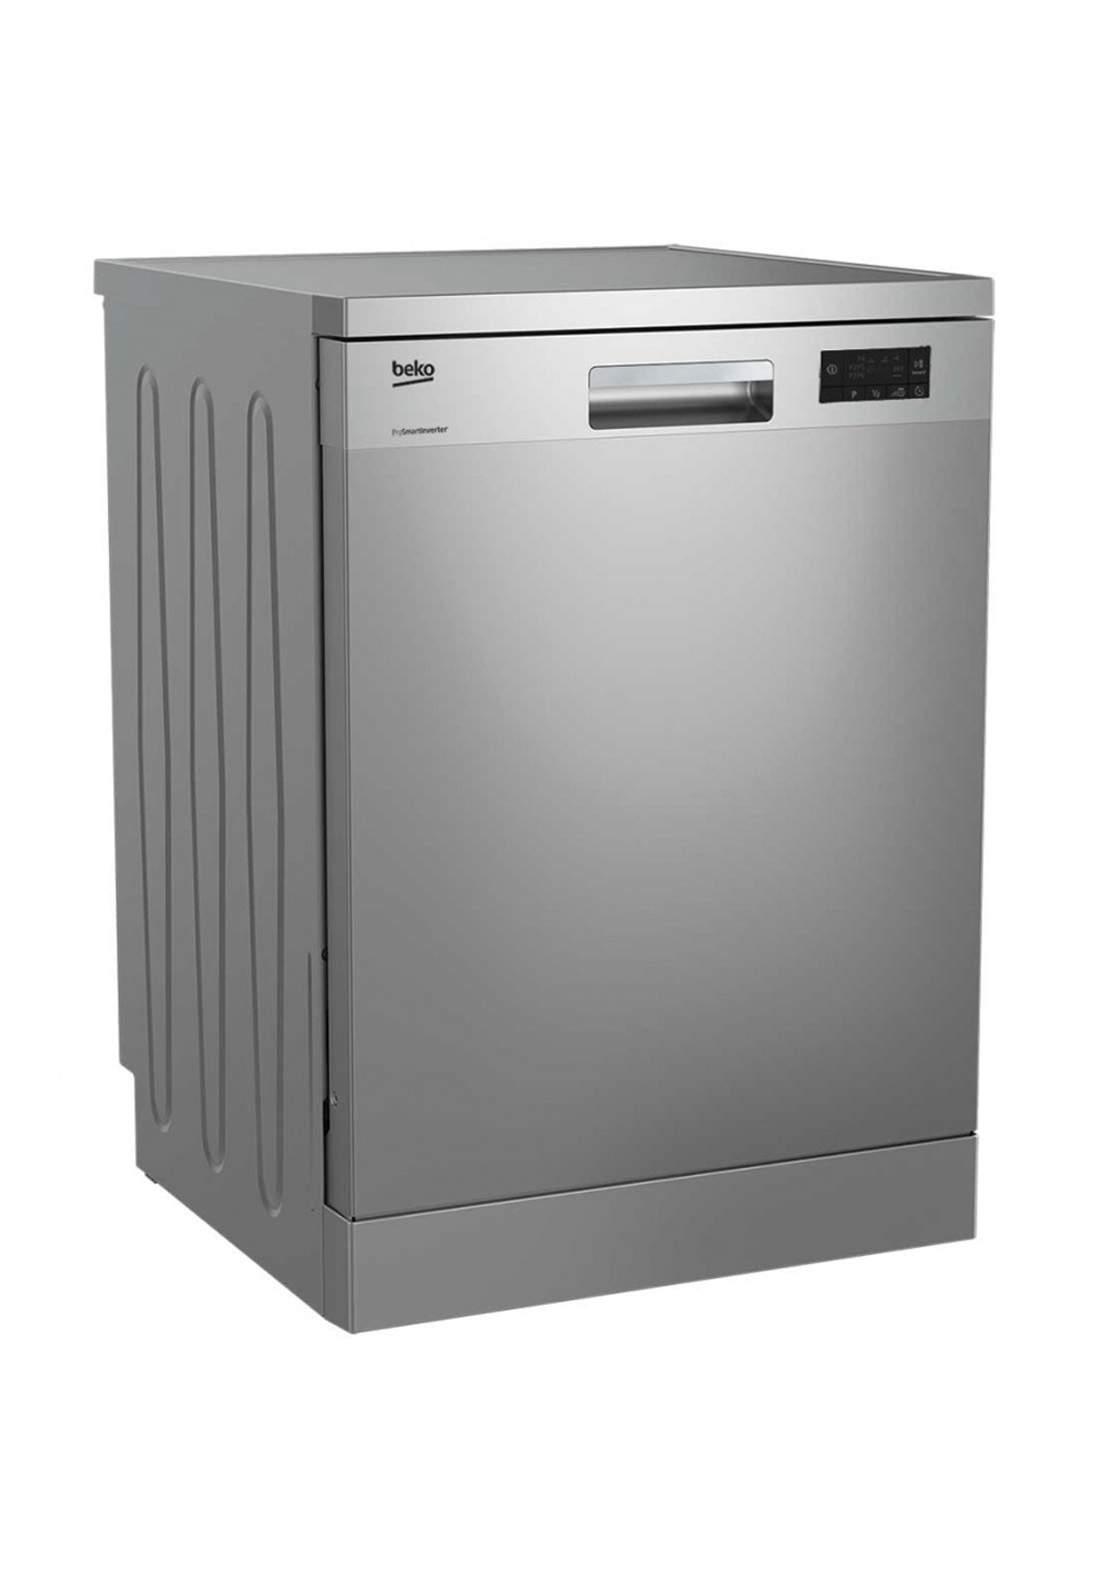 Beko DFN 16410 X Dishwasher 6 Programs Capacity Of 14 Sets - Gray  غسالة صحون